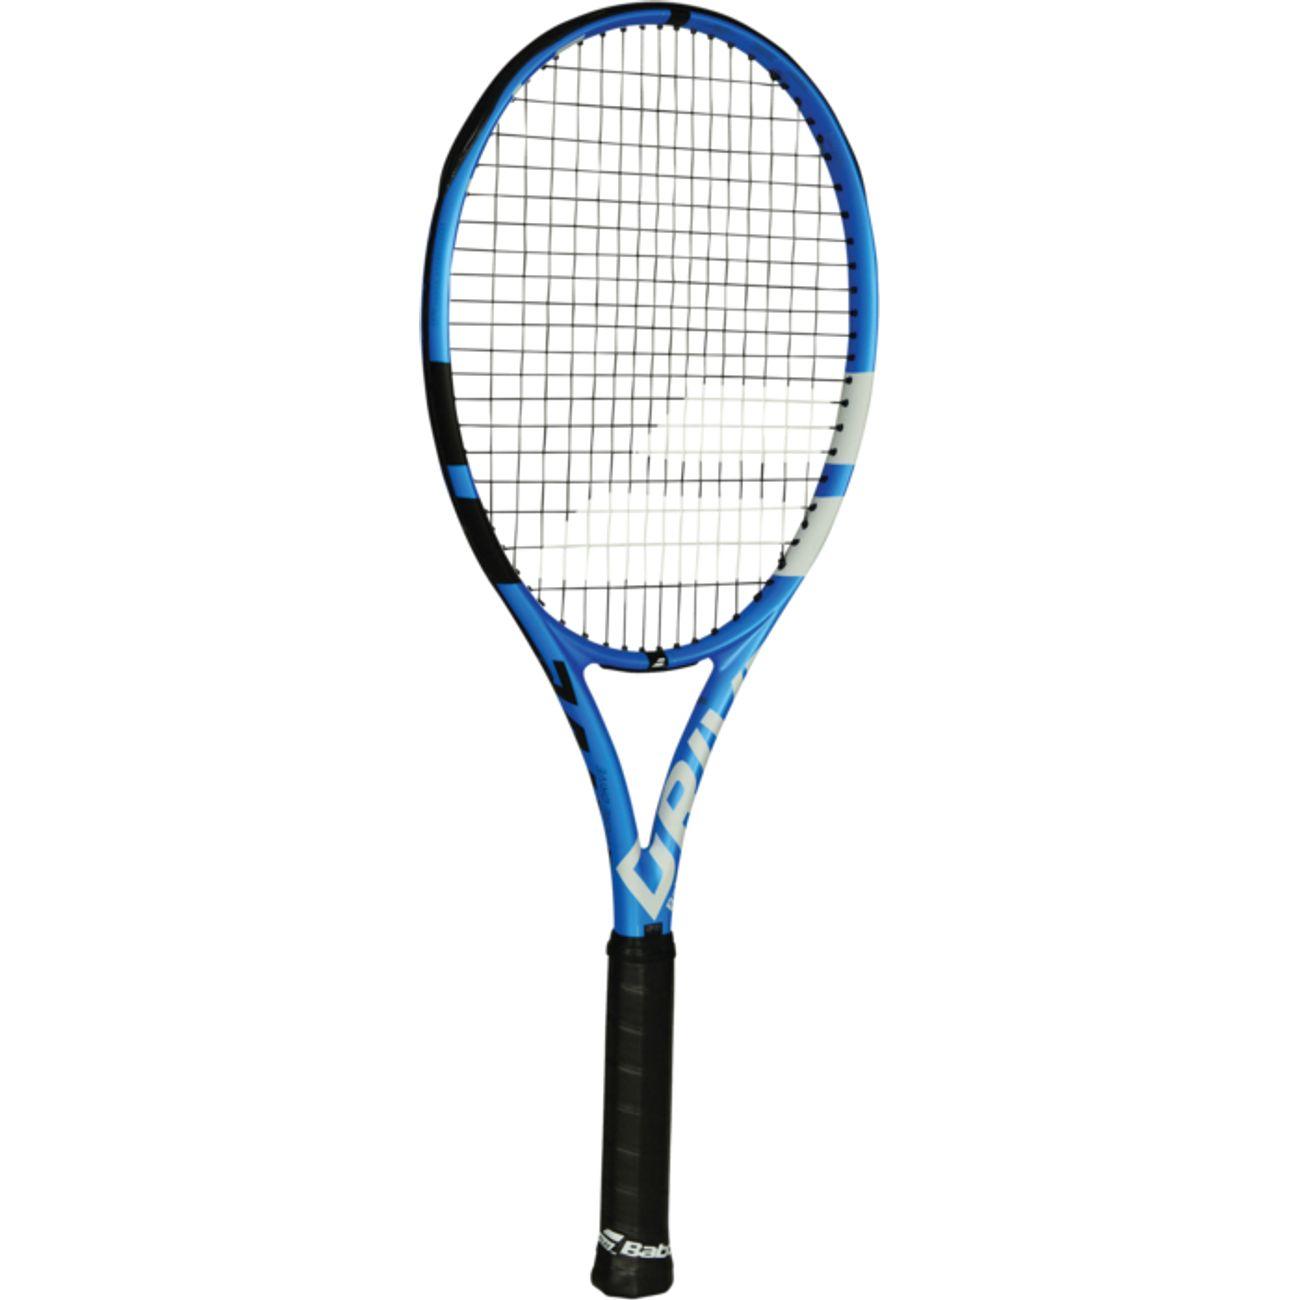 RAQUETTE Tennis adulte BABOLAT PURE DRIVE